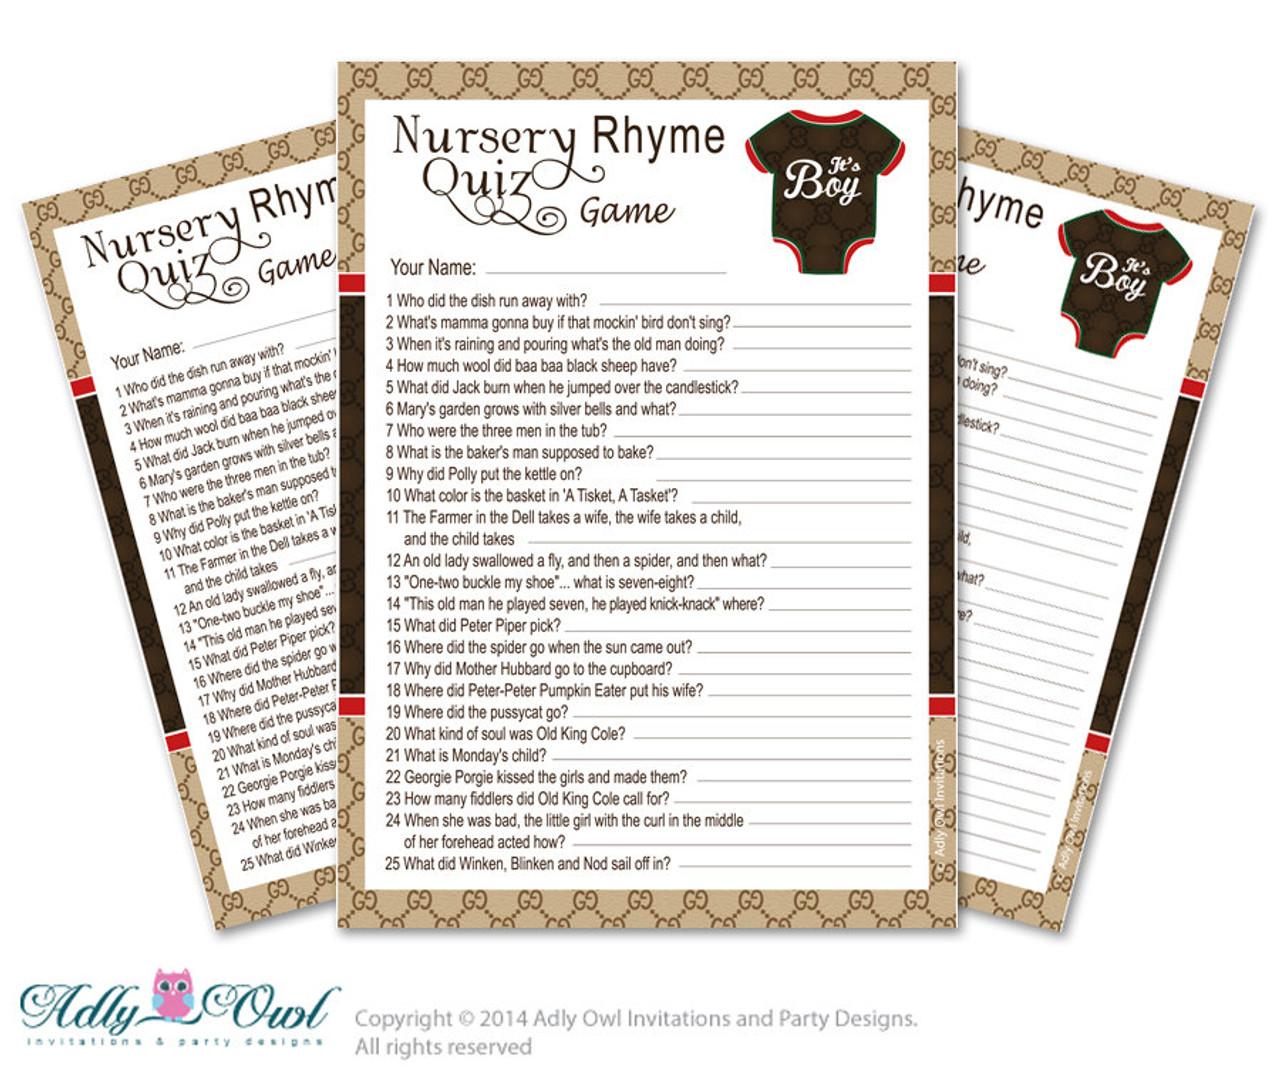 Gucci Boy Fashion Nursery Rhyme Game, Find Rhyme Game Quiz for Baby shower  Fashion Shower DIY Brown Red